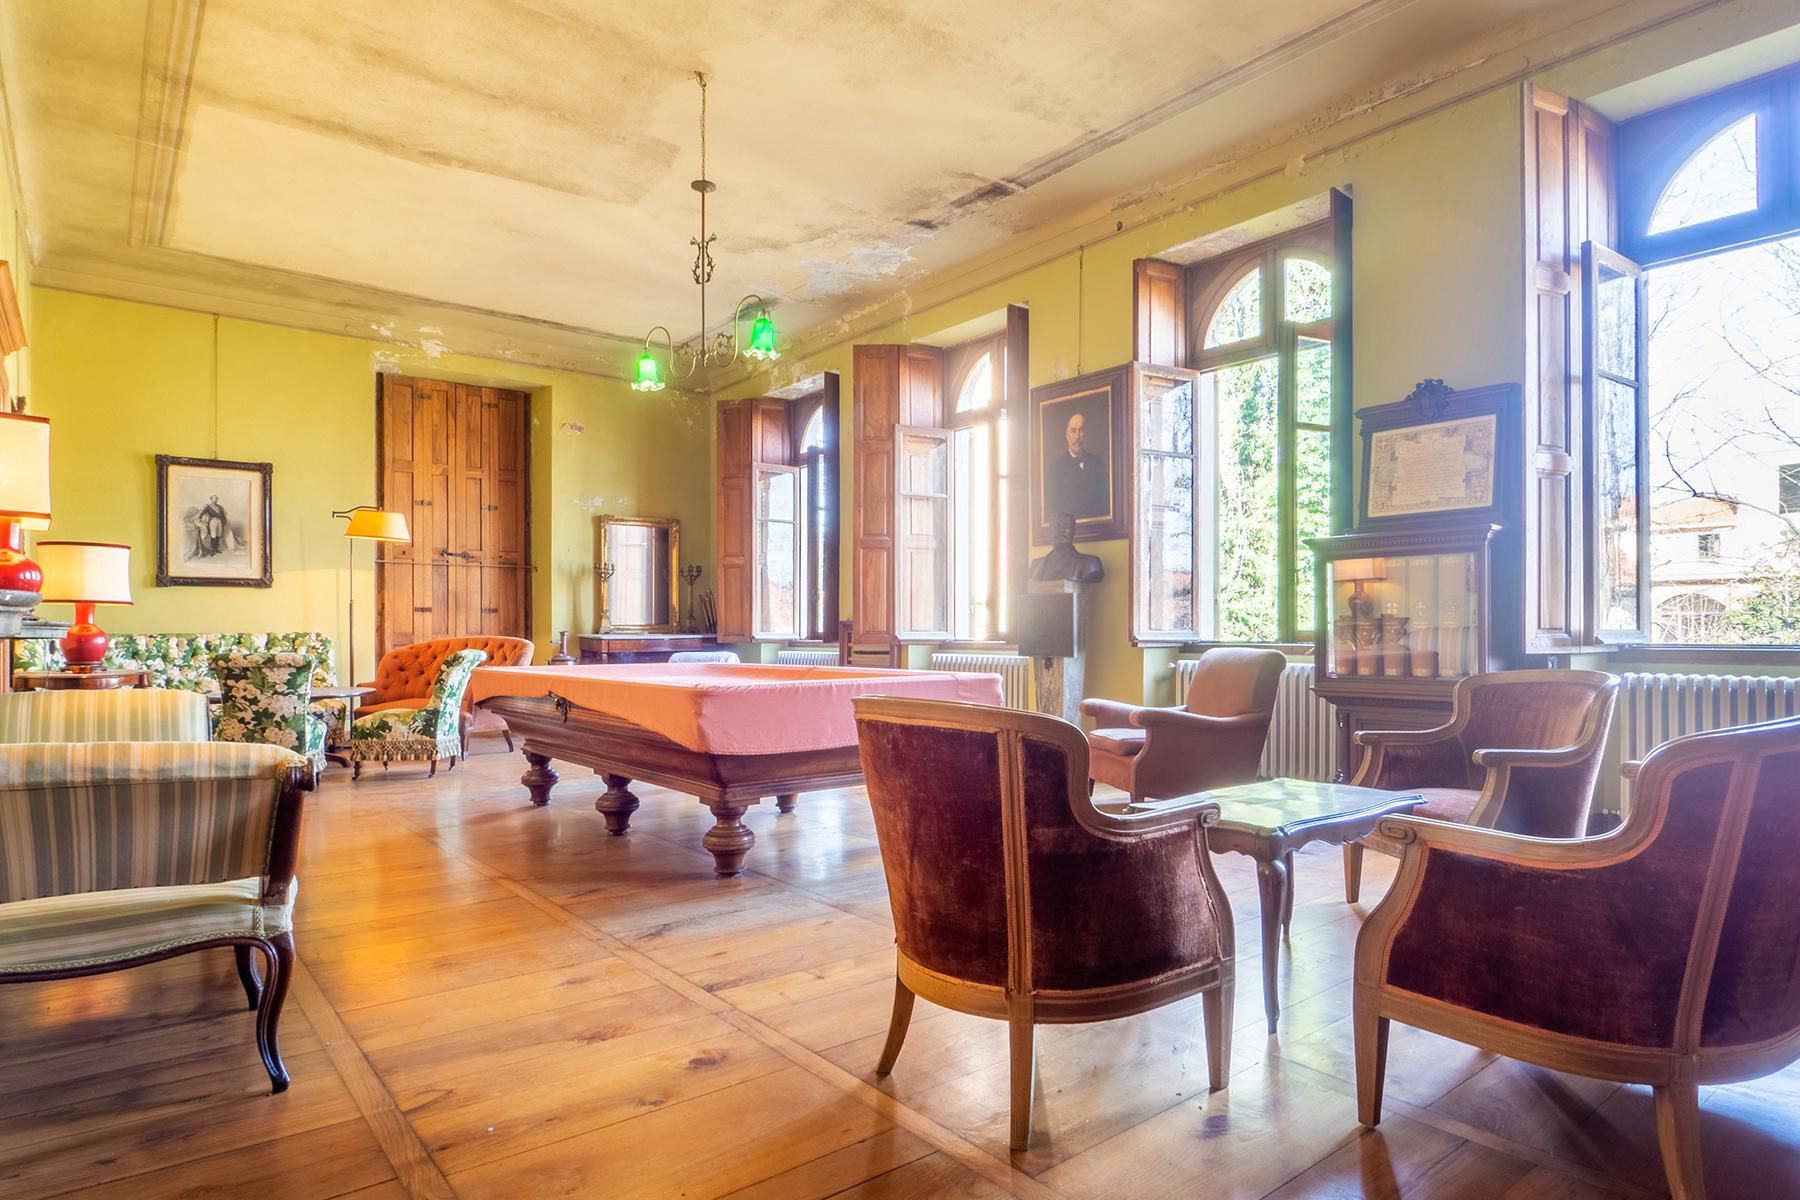 Historical Villa with private garden - 2